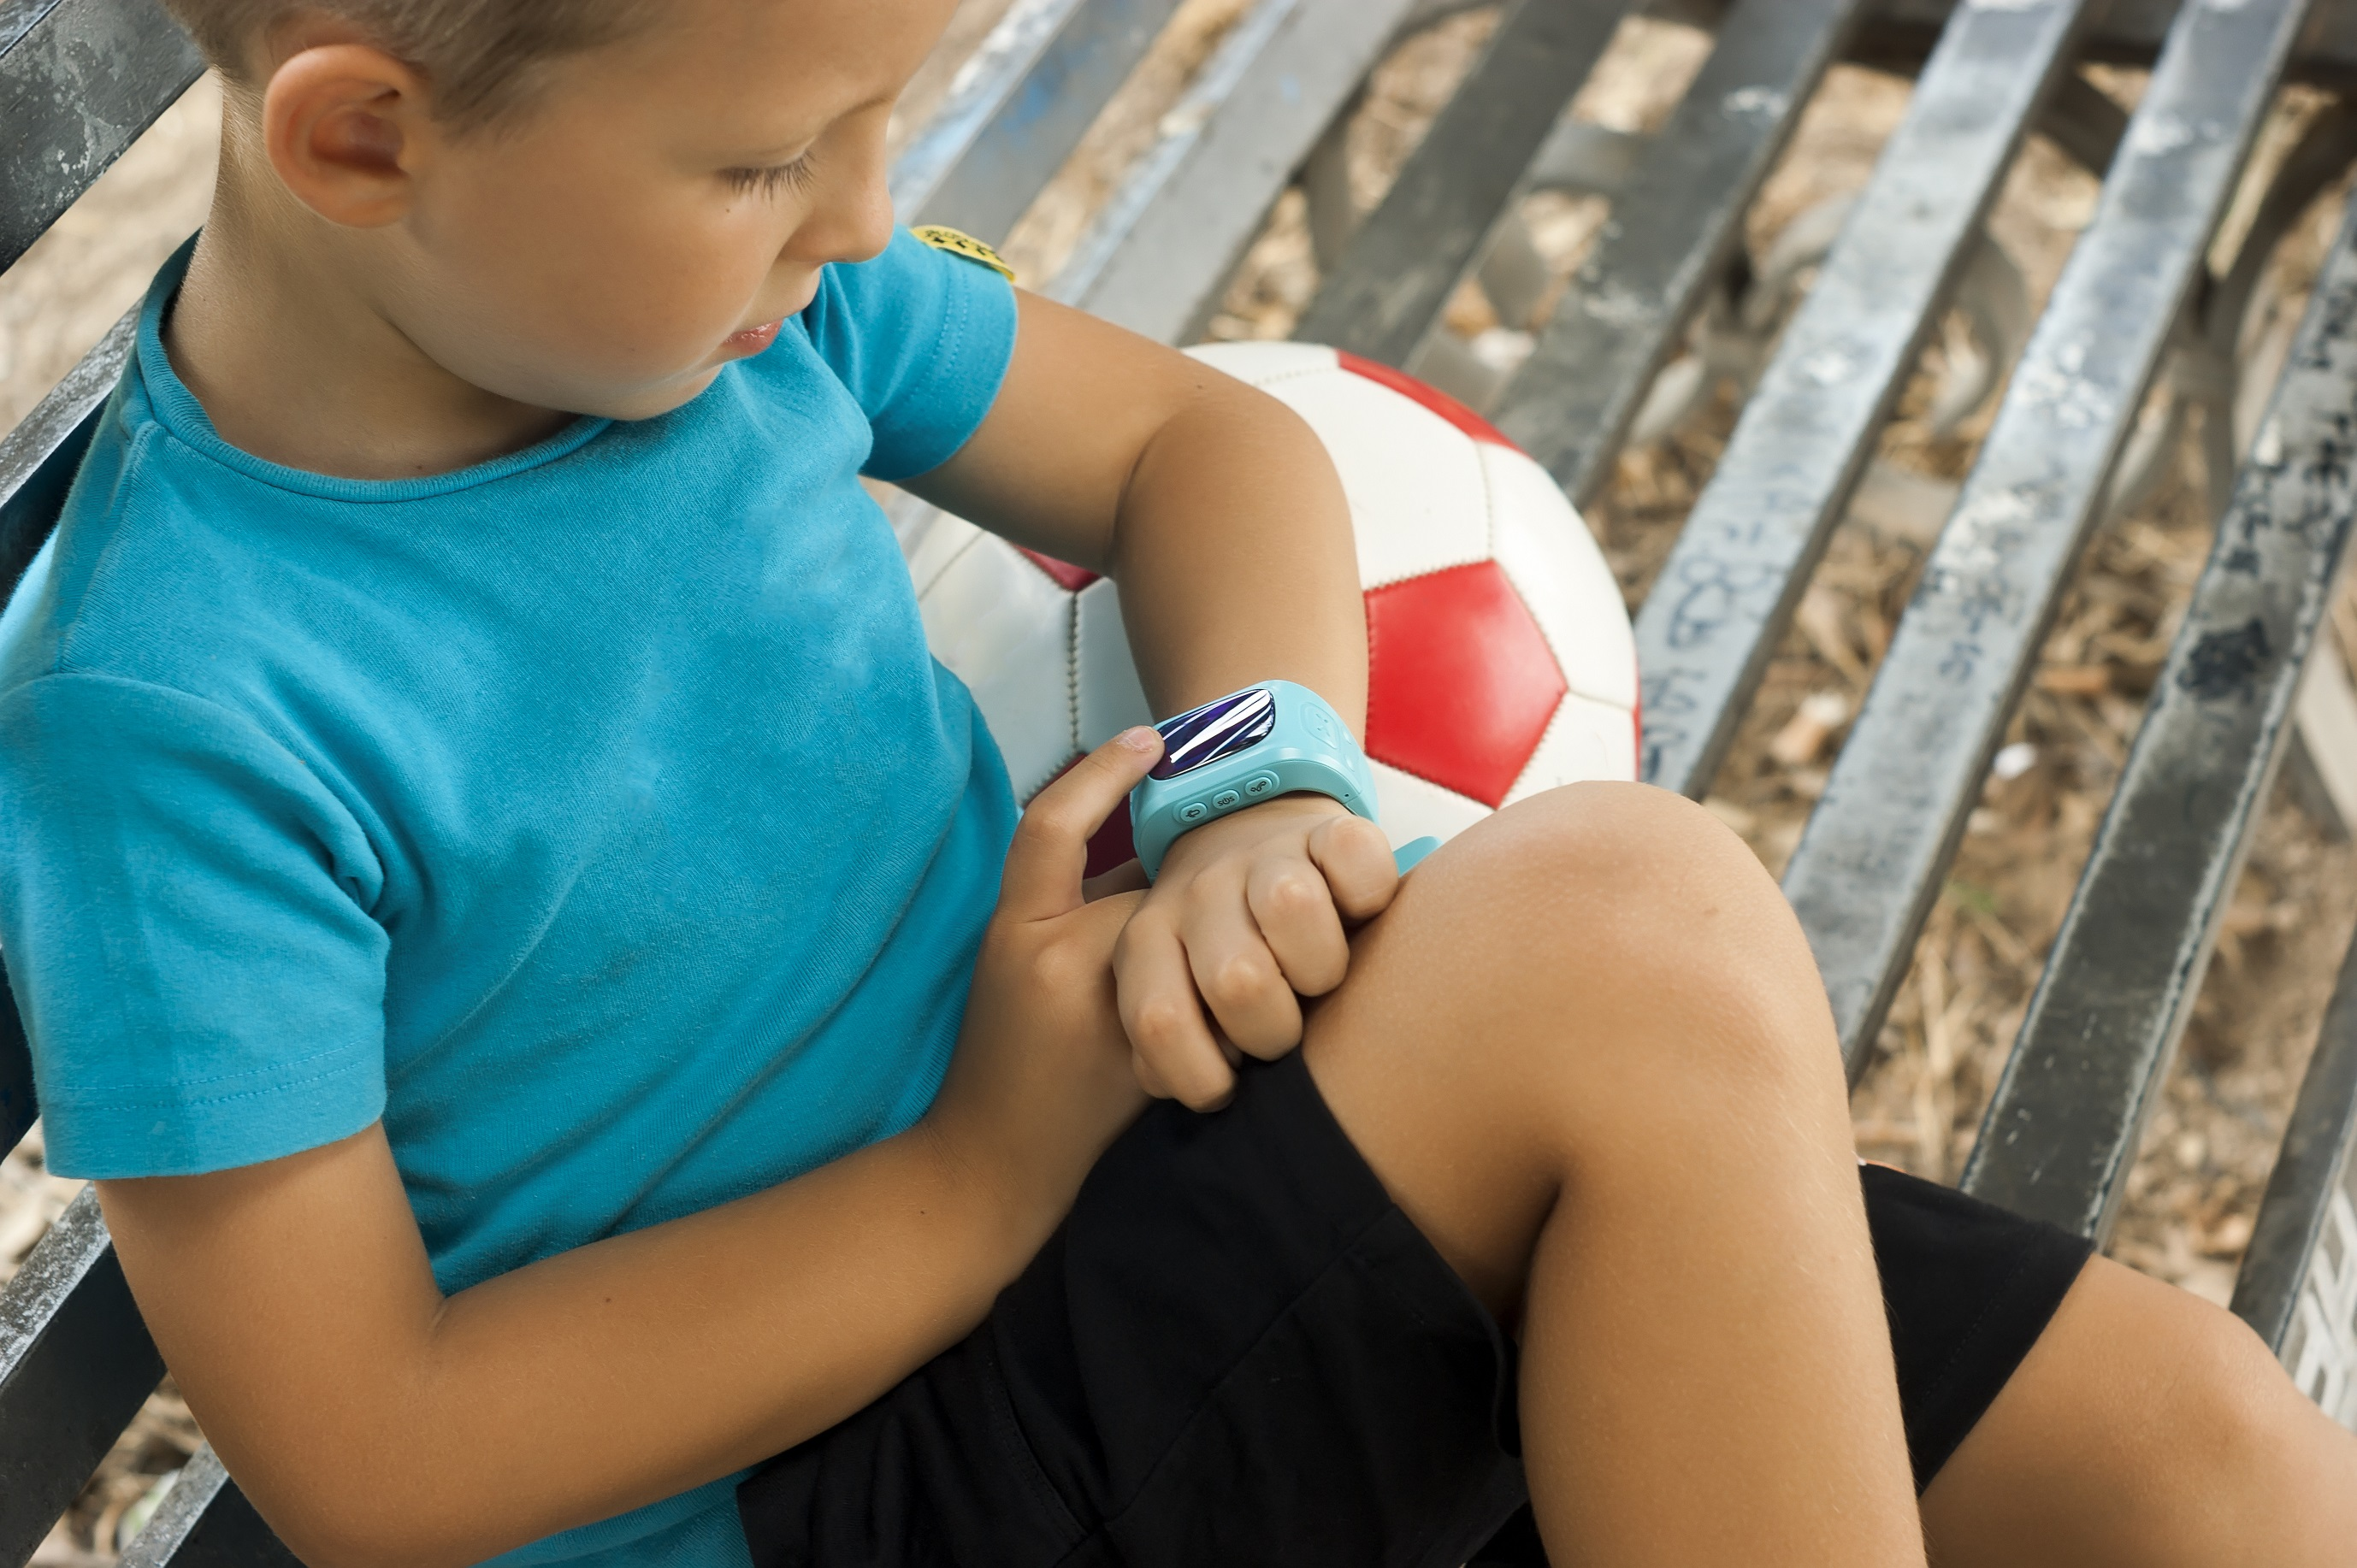 GPS Kinder Tracking Uhr mit Telefon SOS und Telefon - Funktion